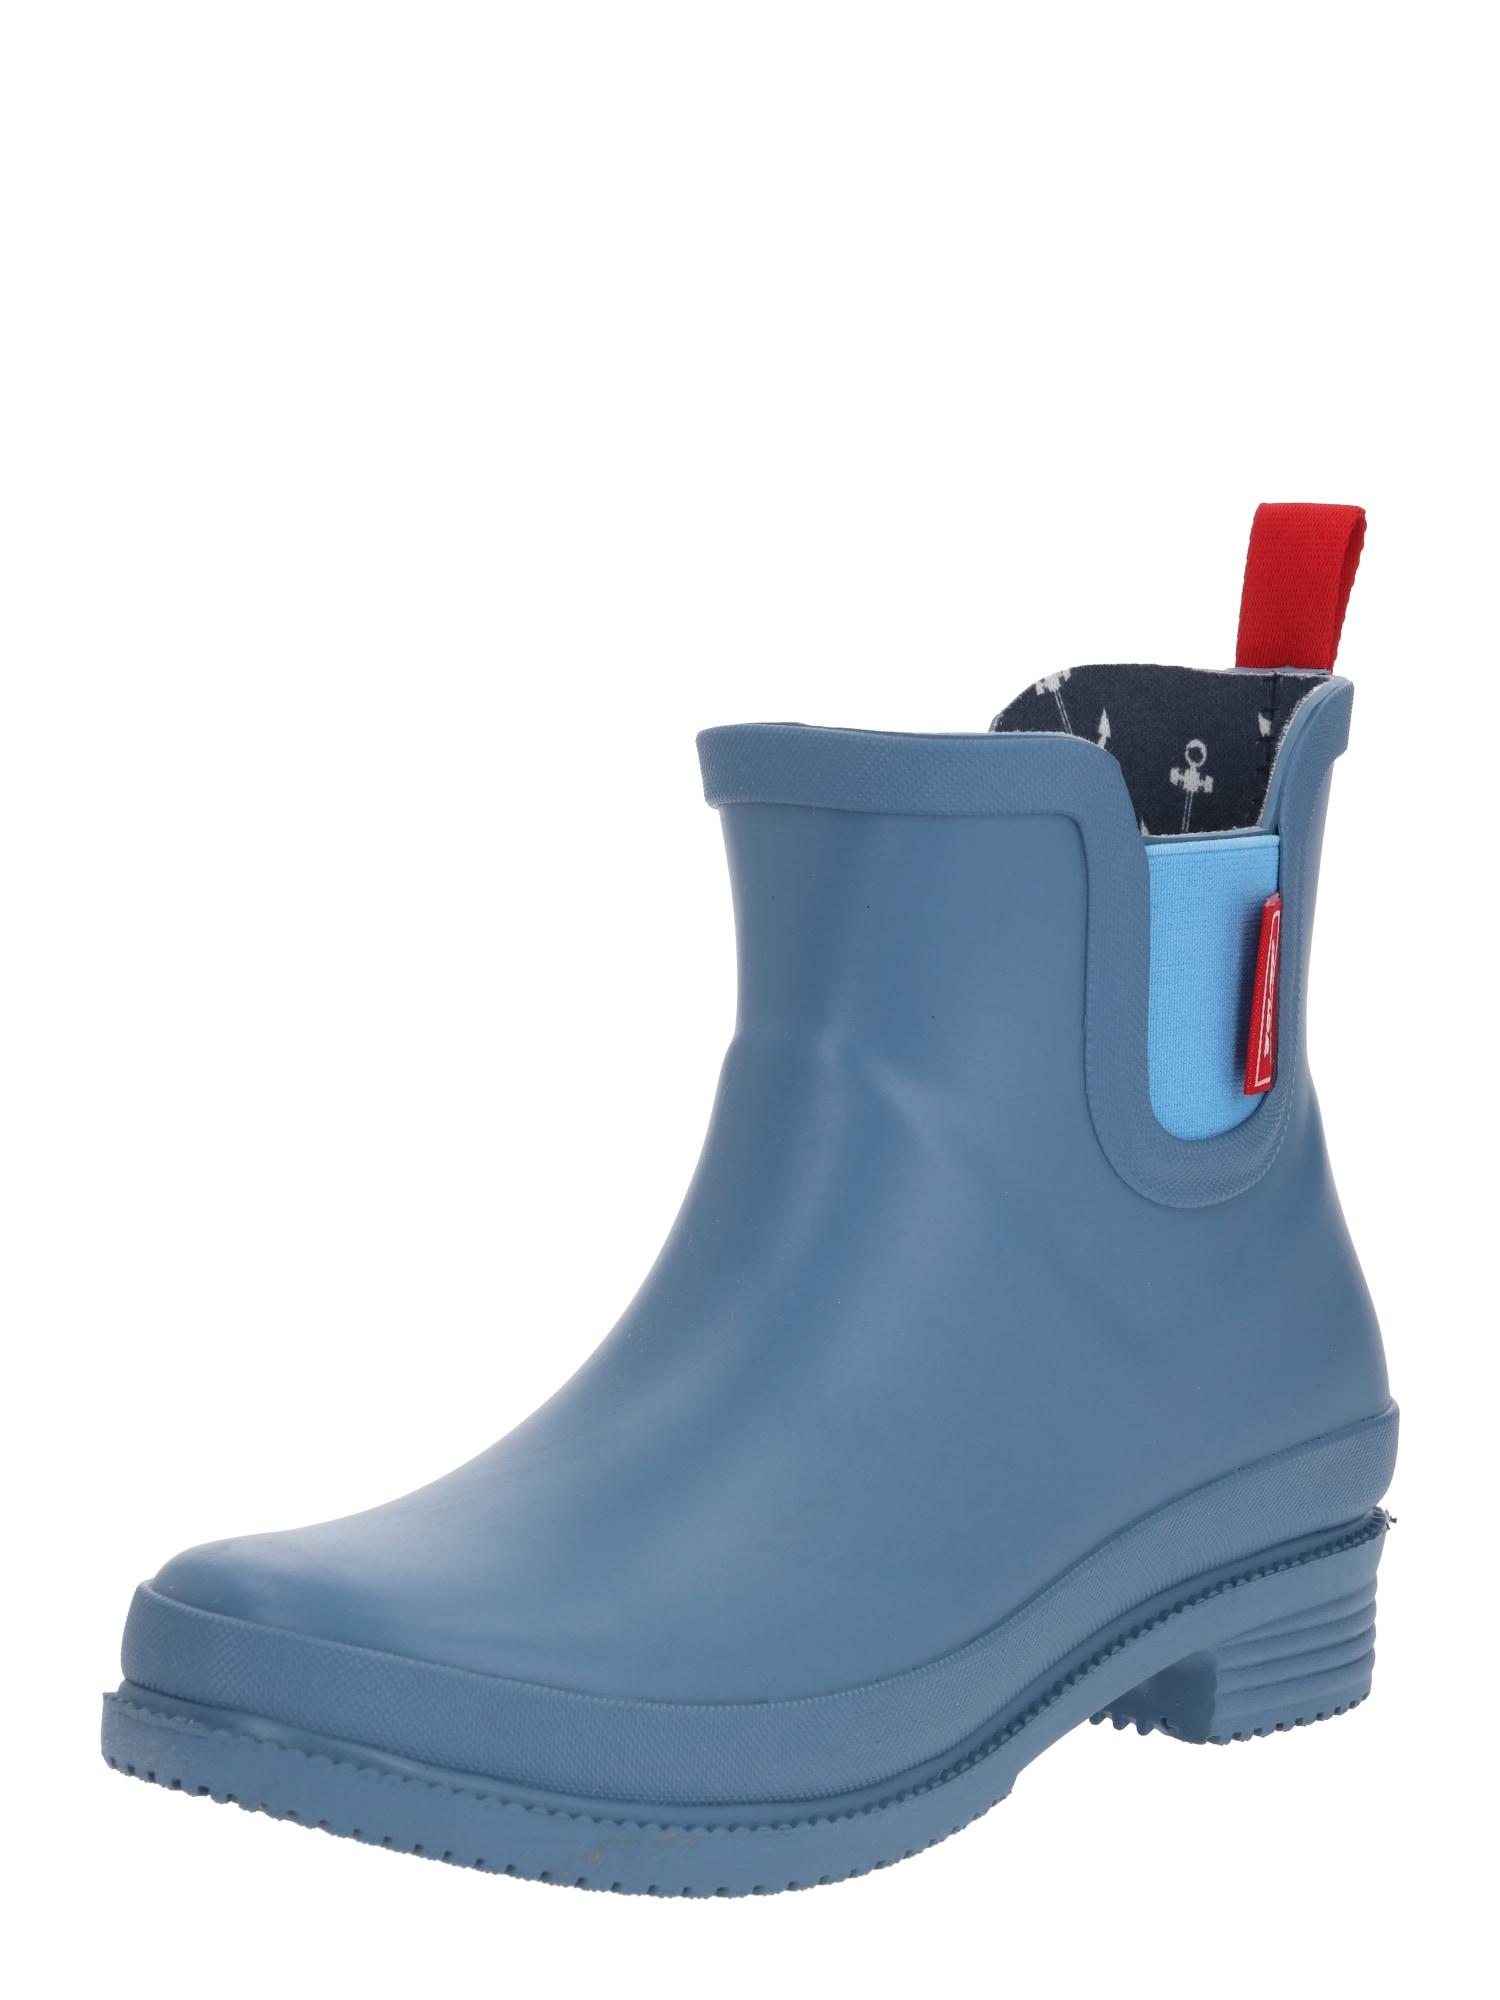 Derbe Guminiai batai 'Taai-Botten' mėlyna